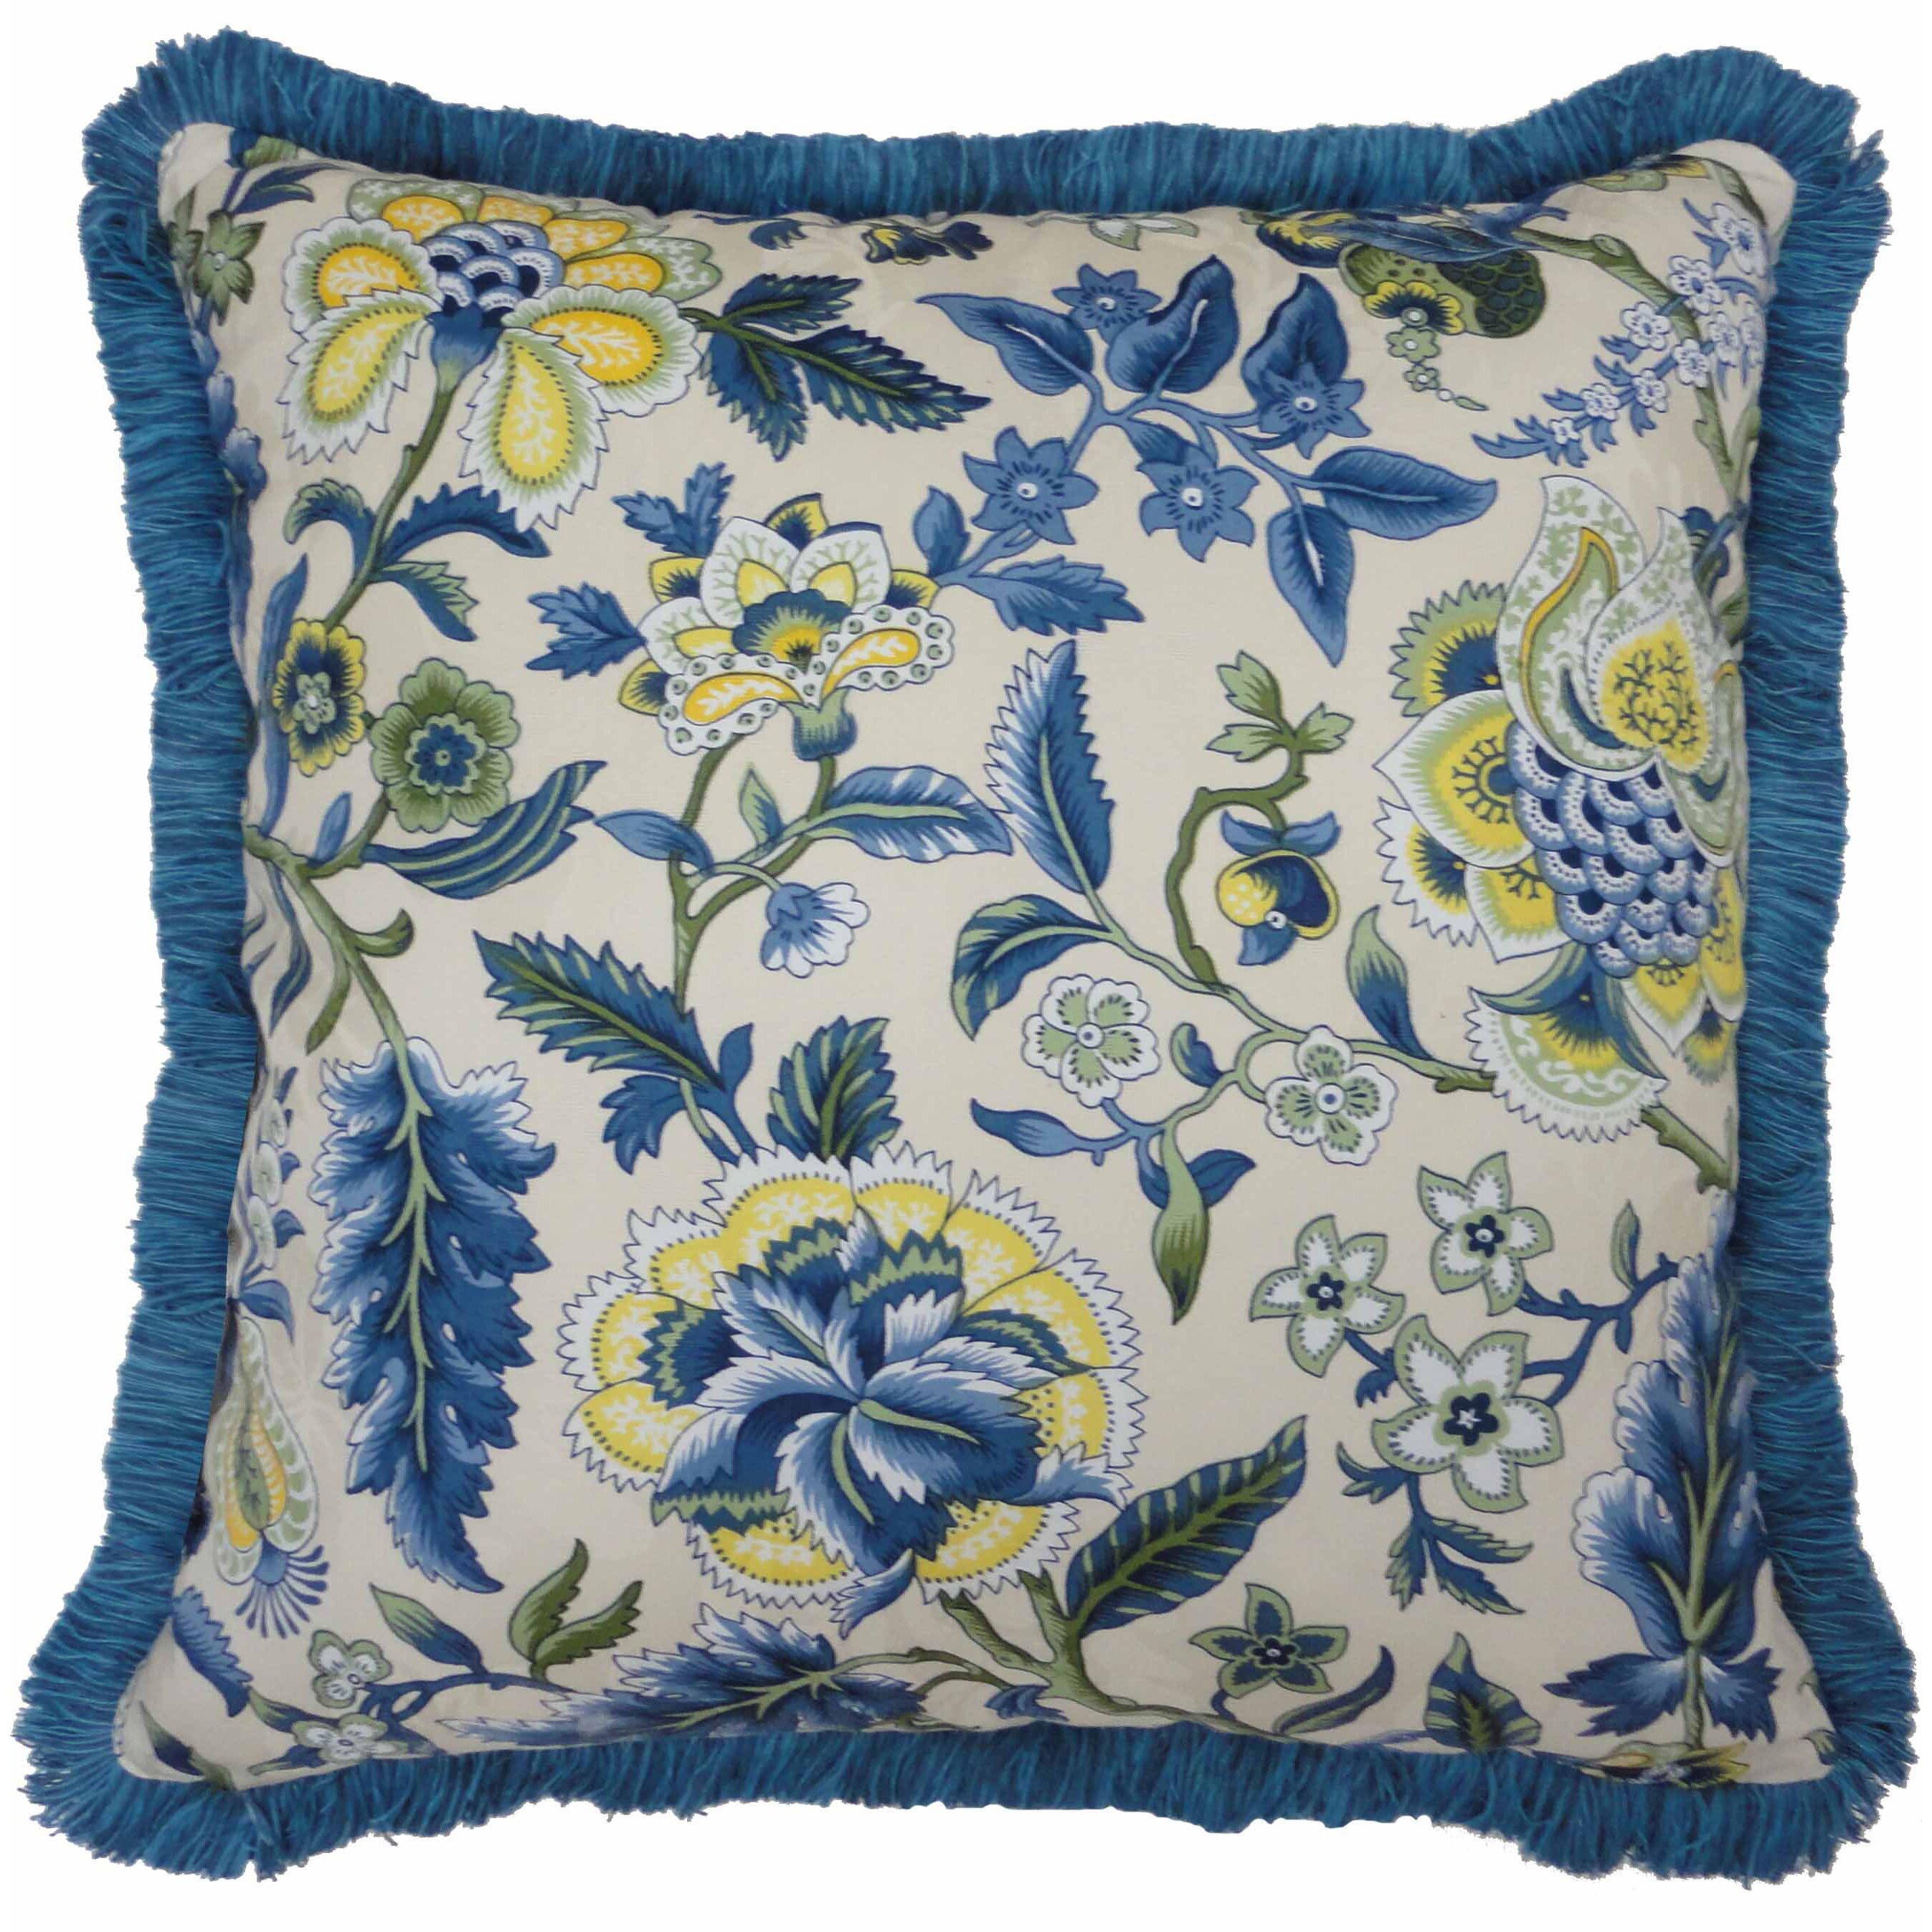 Waverly Decorative Throw Pillows : Waverly Imperial Dress Garden Path Striped Reversible Cotton Throw Pillow & Reviews Wayfair